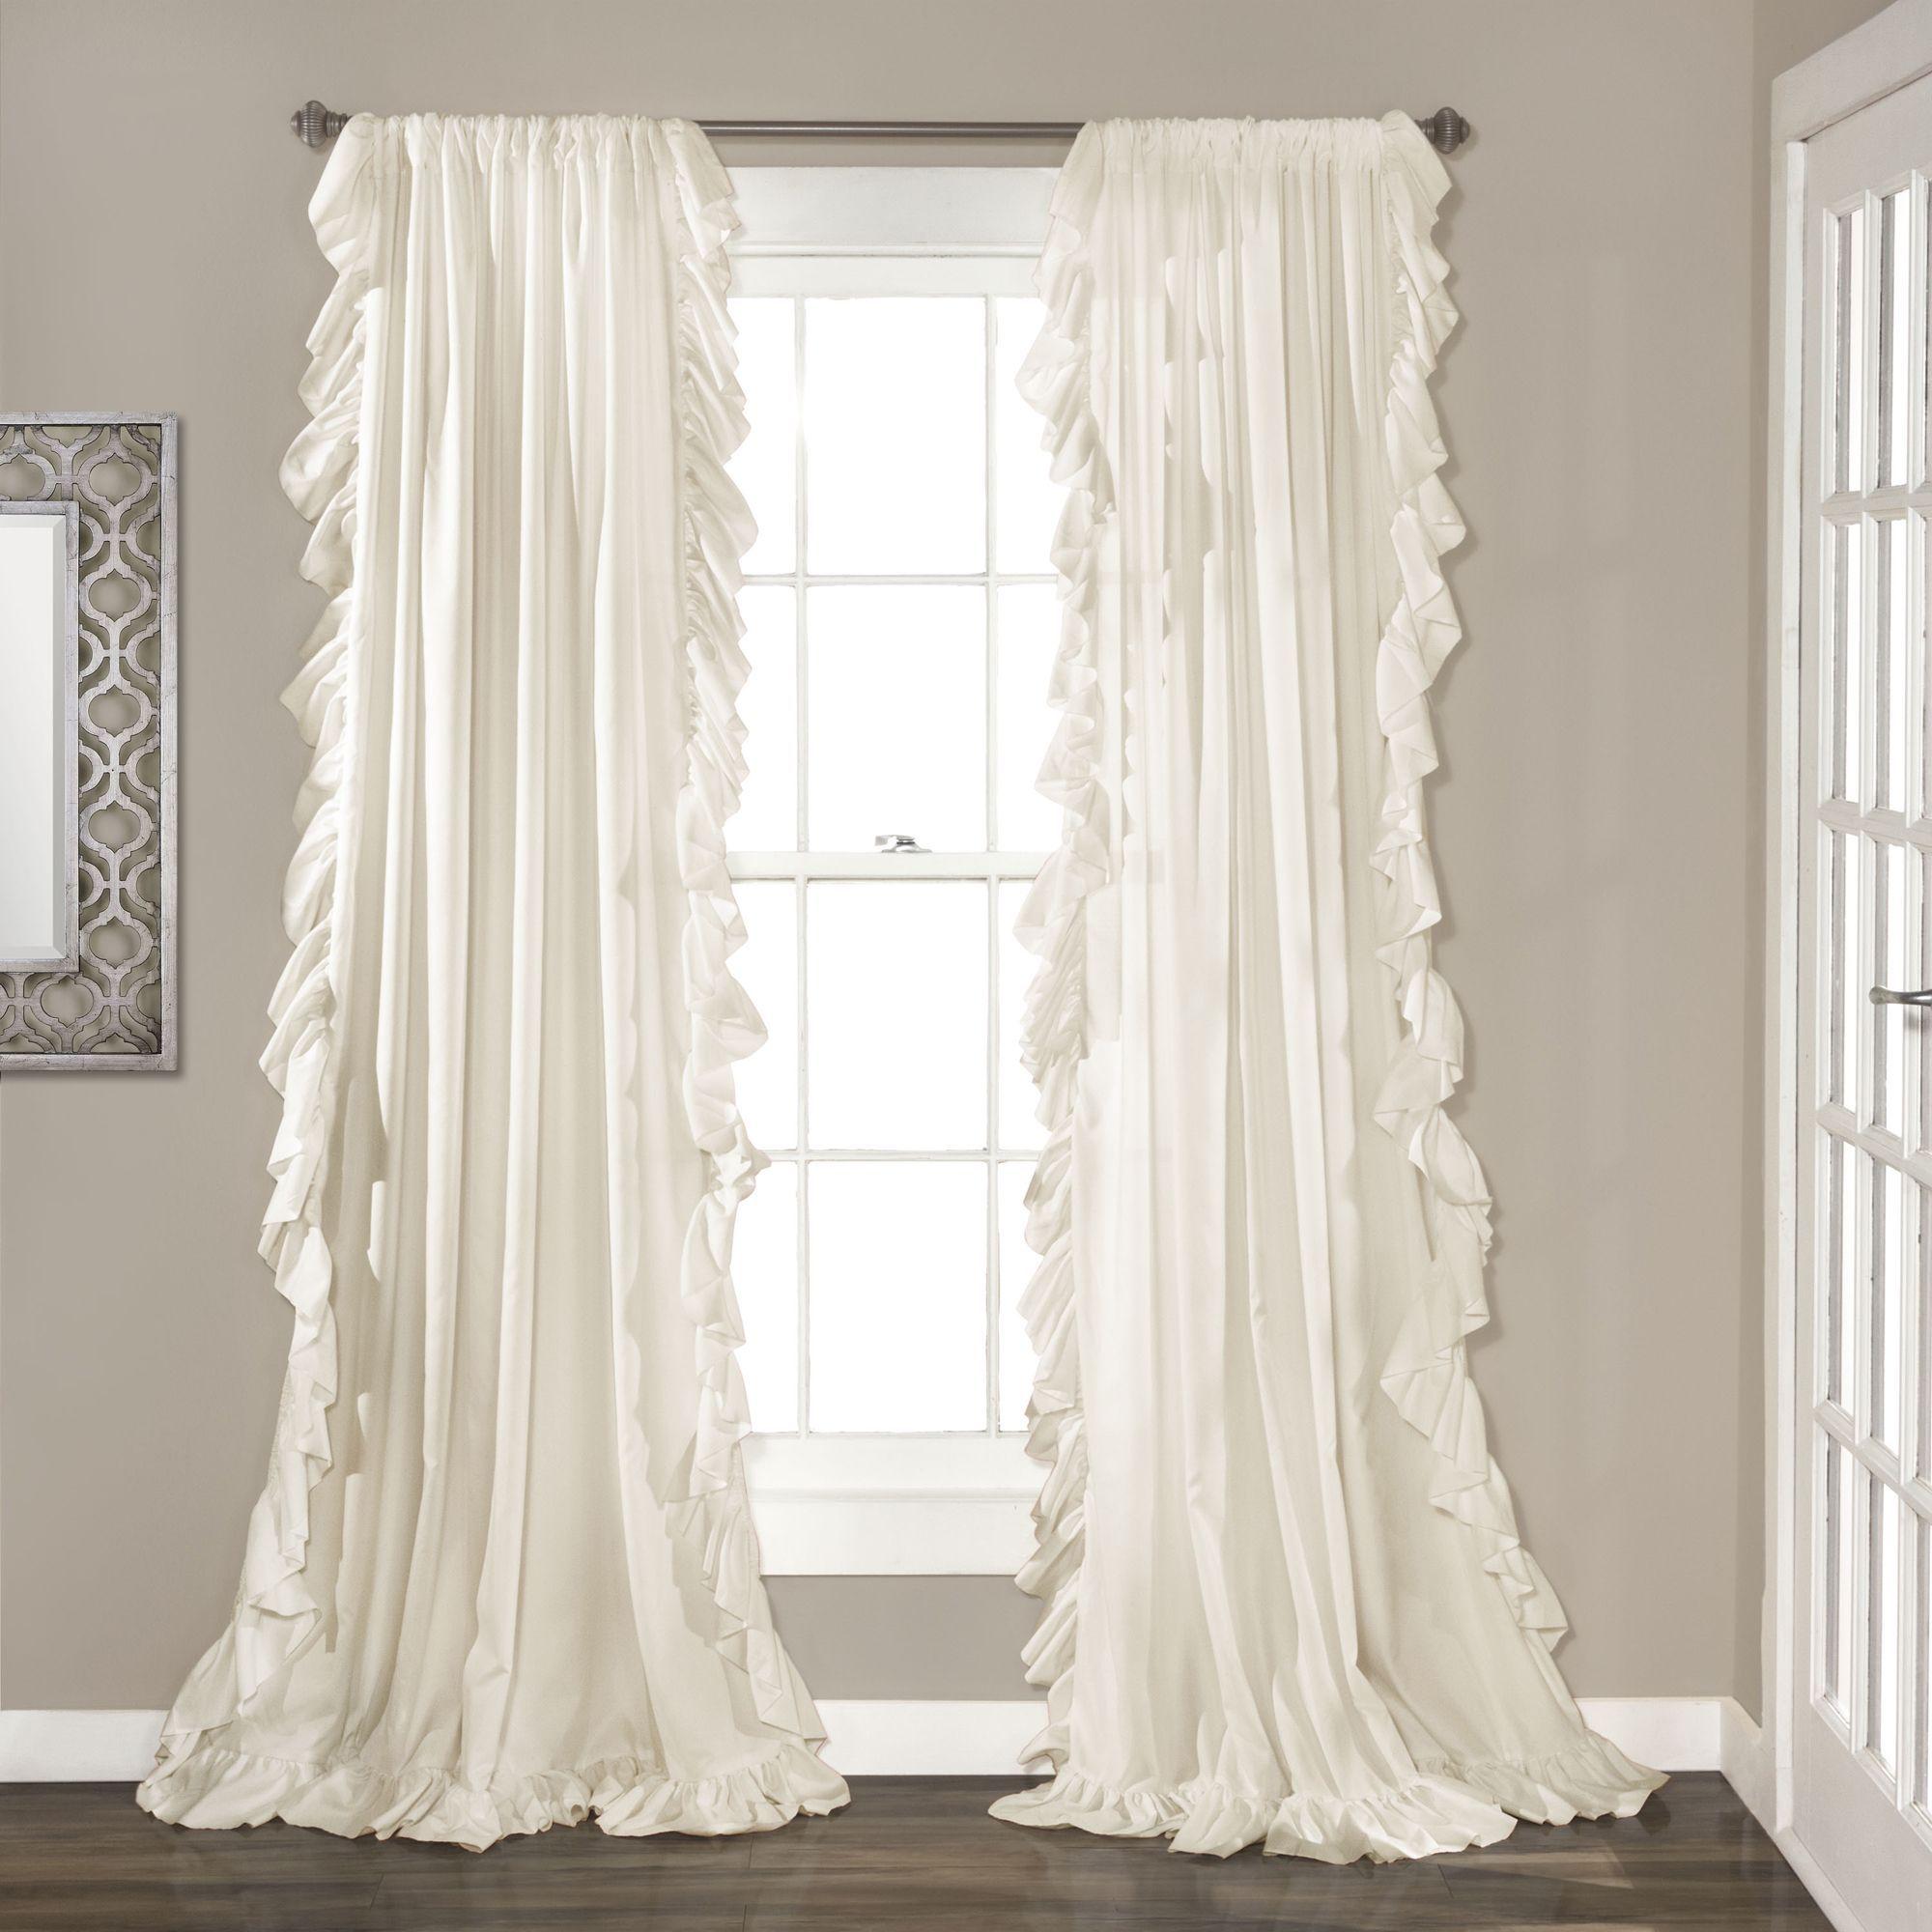 Lush Decor Reyna Curtain Panel Pair   LUSH, Beige and Ivory